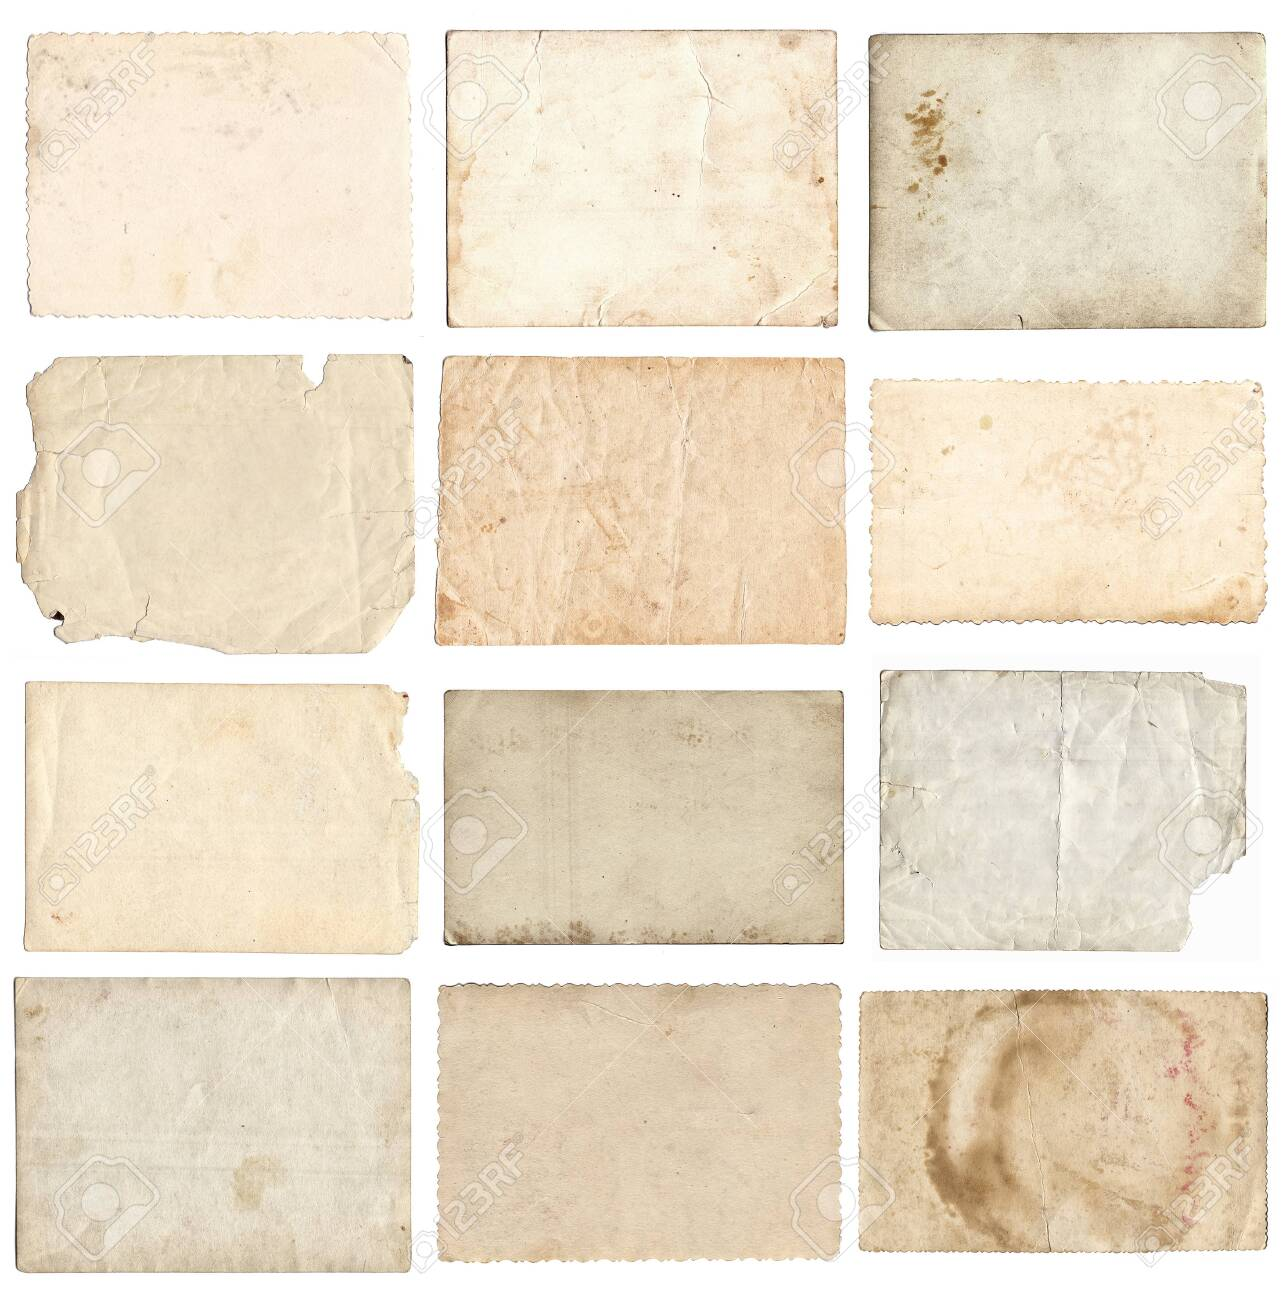 Set of various retro old photos isolated on white background - 122762415